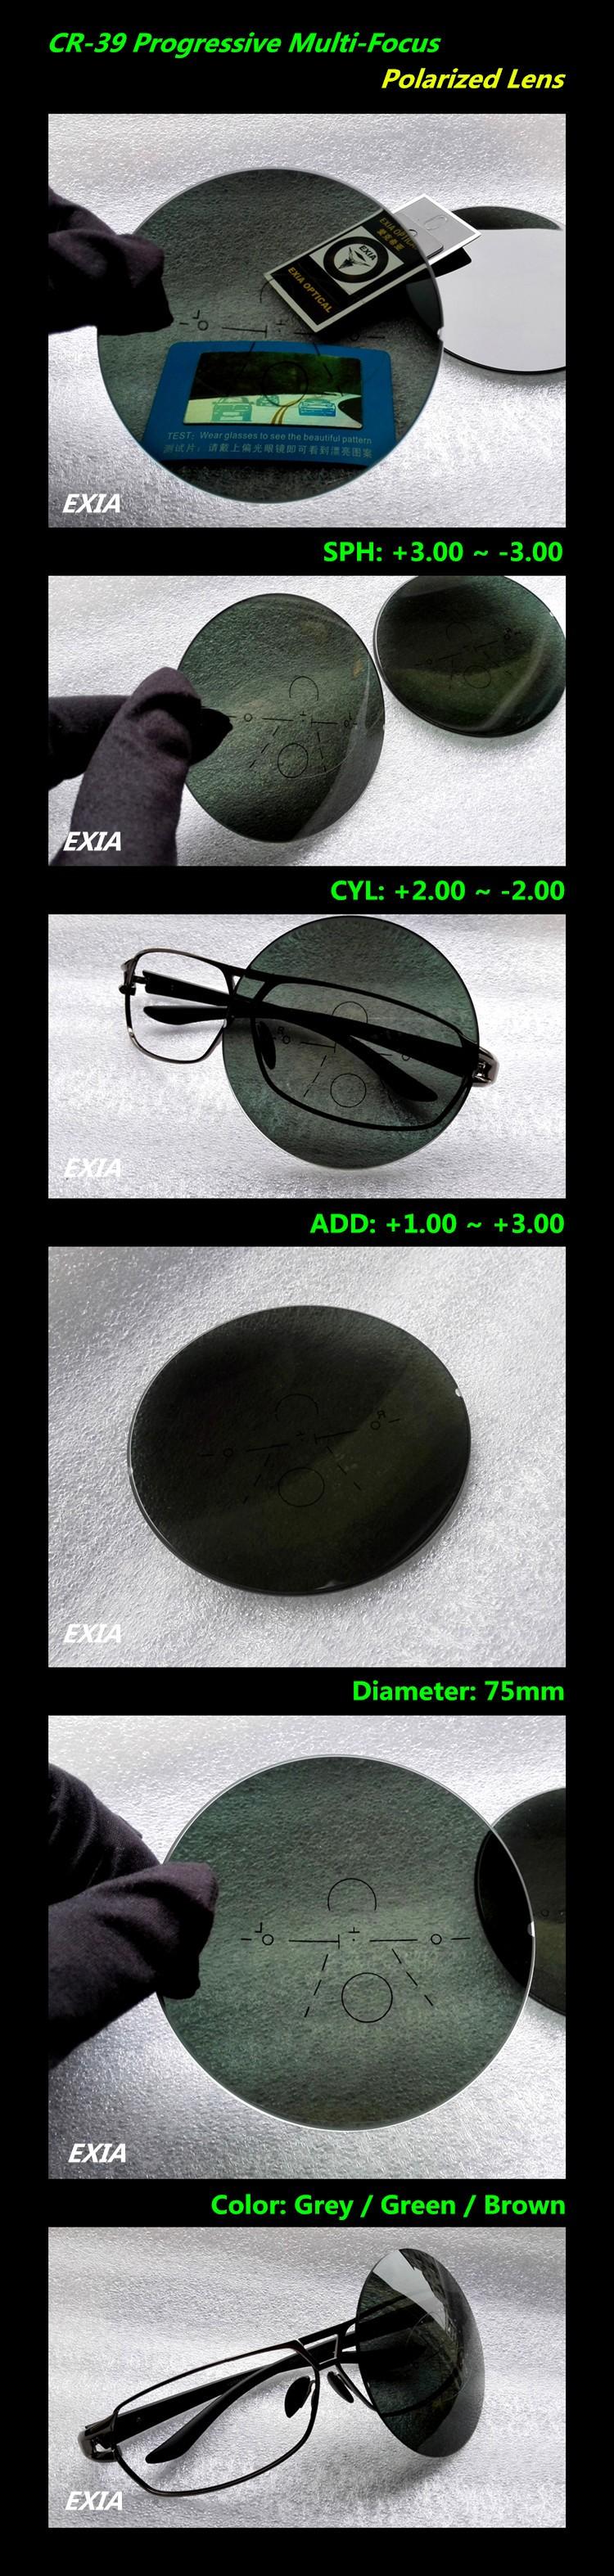 717a889d412 1.56 Index Optical Progressive Polarized Grey Sunglasses Lenses ...